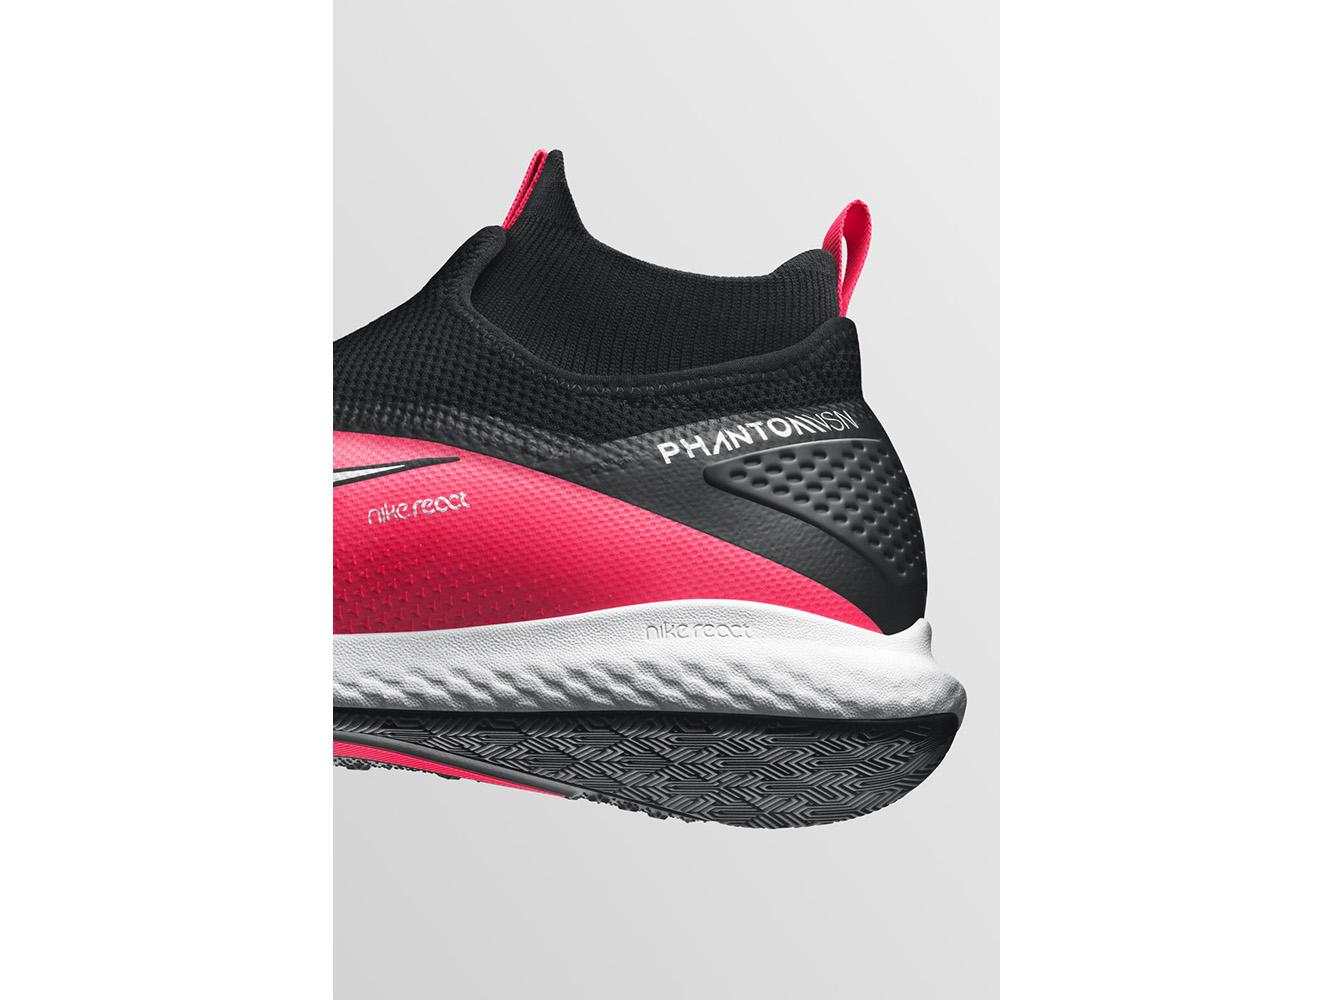 Nike_Football_PhantomVSN2_IC_2_93361